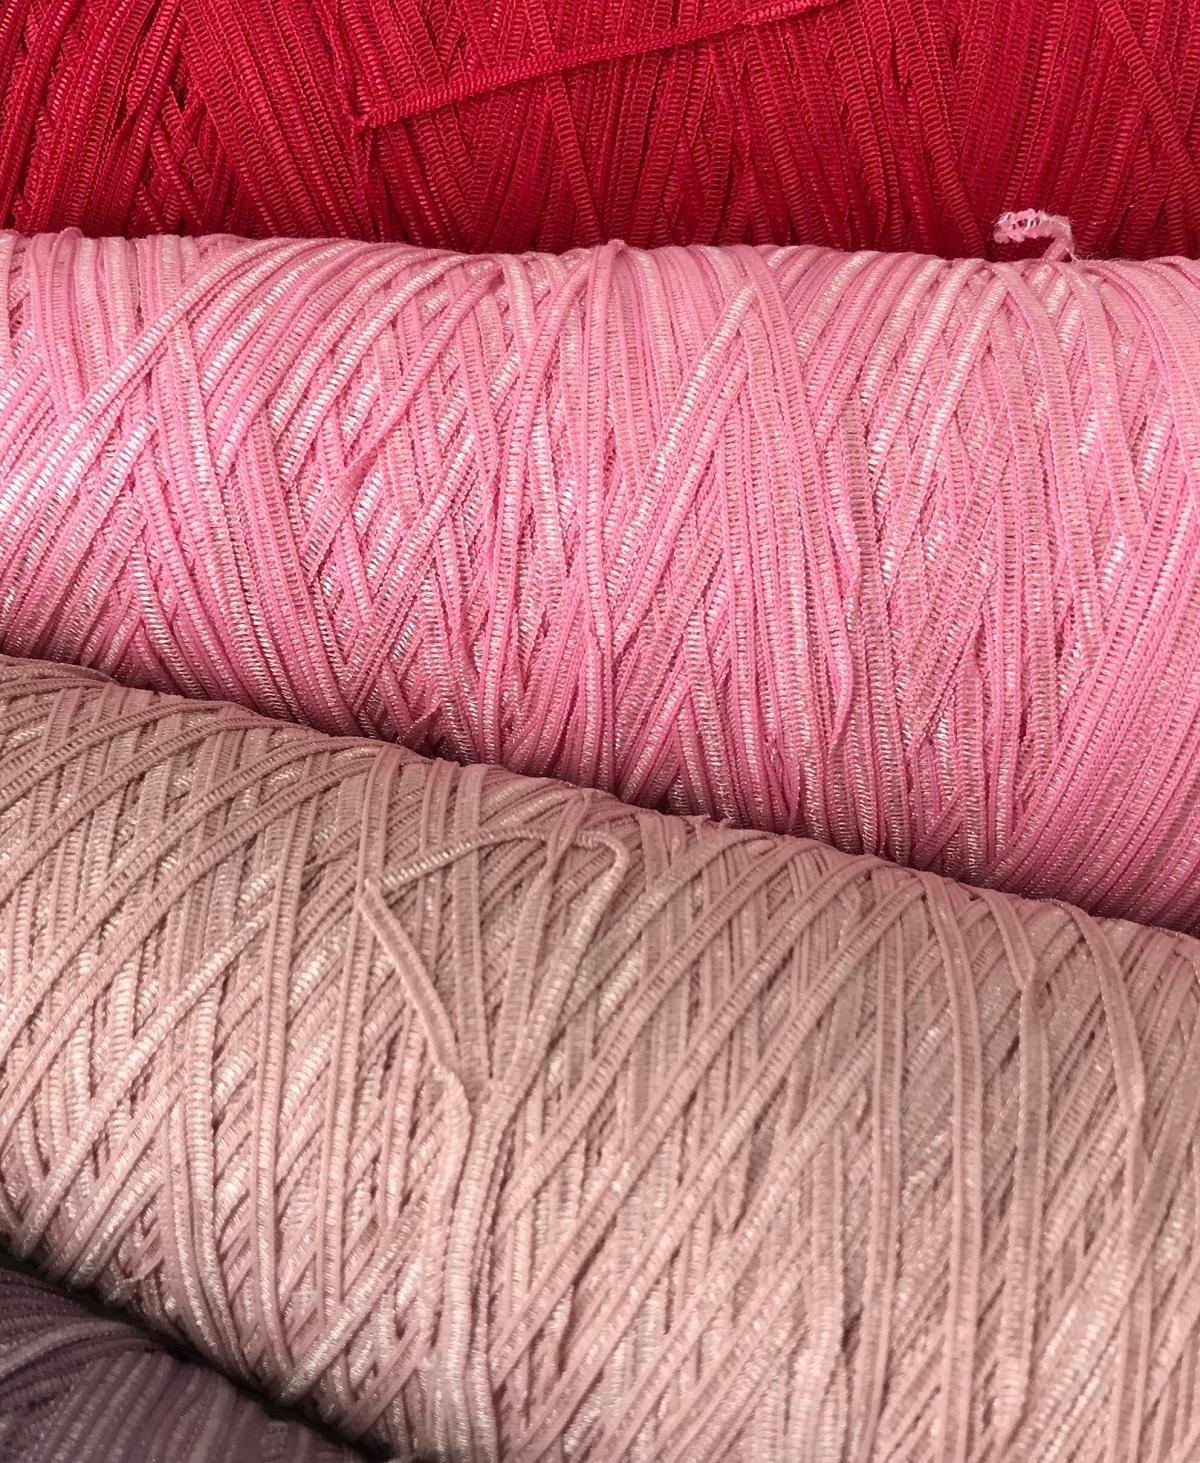 CottonSilk Ribbon  promopack 13 x 100meter